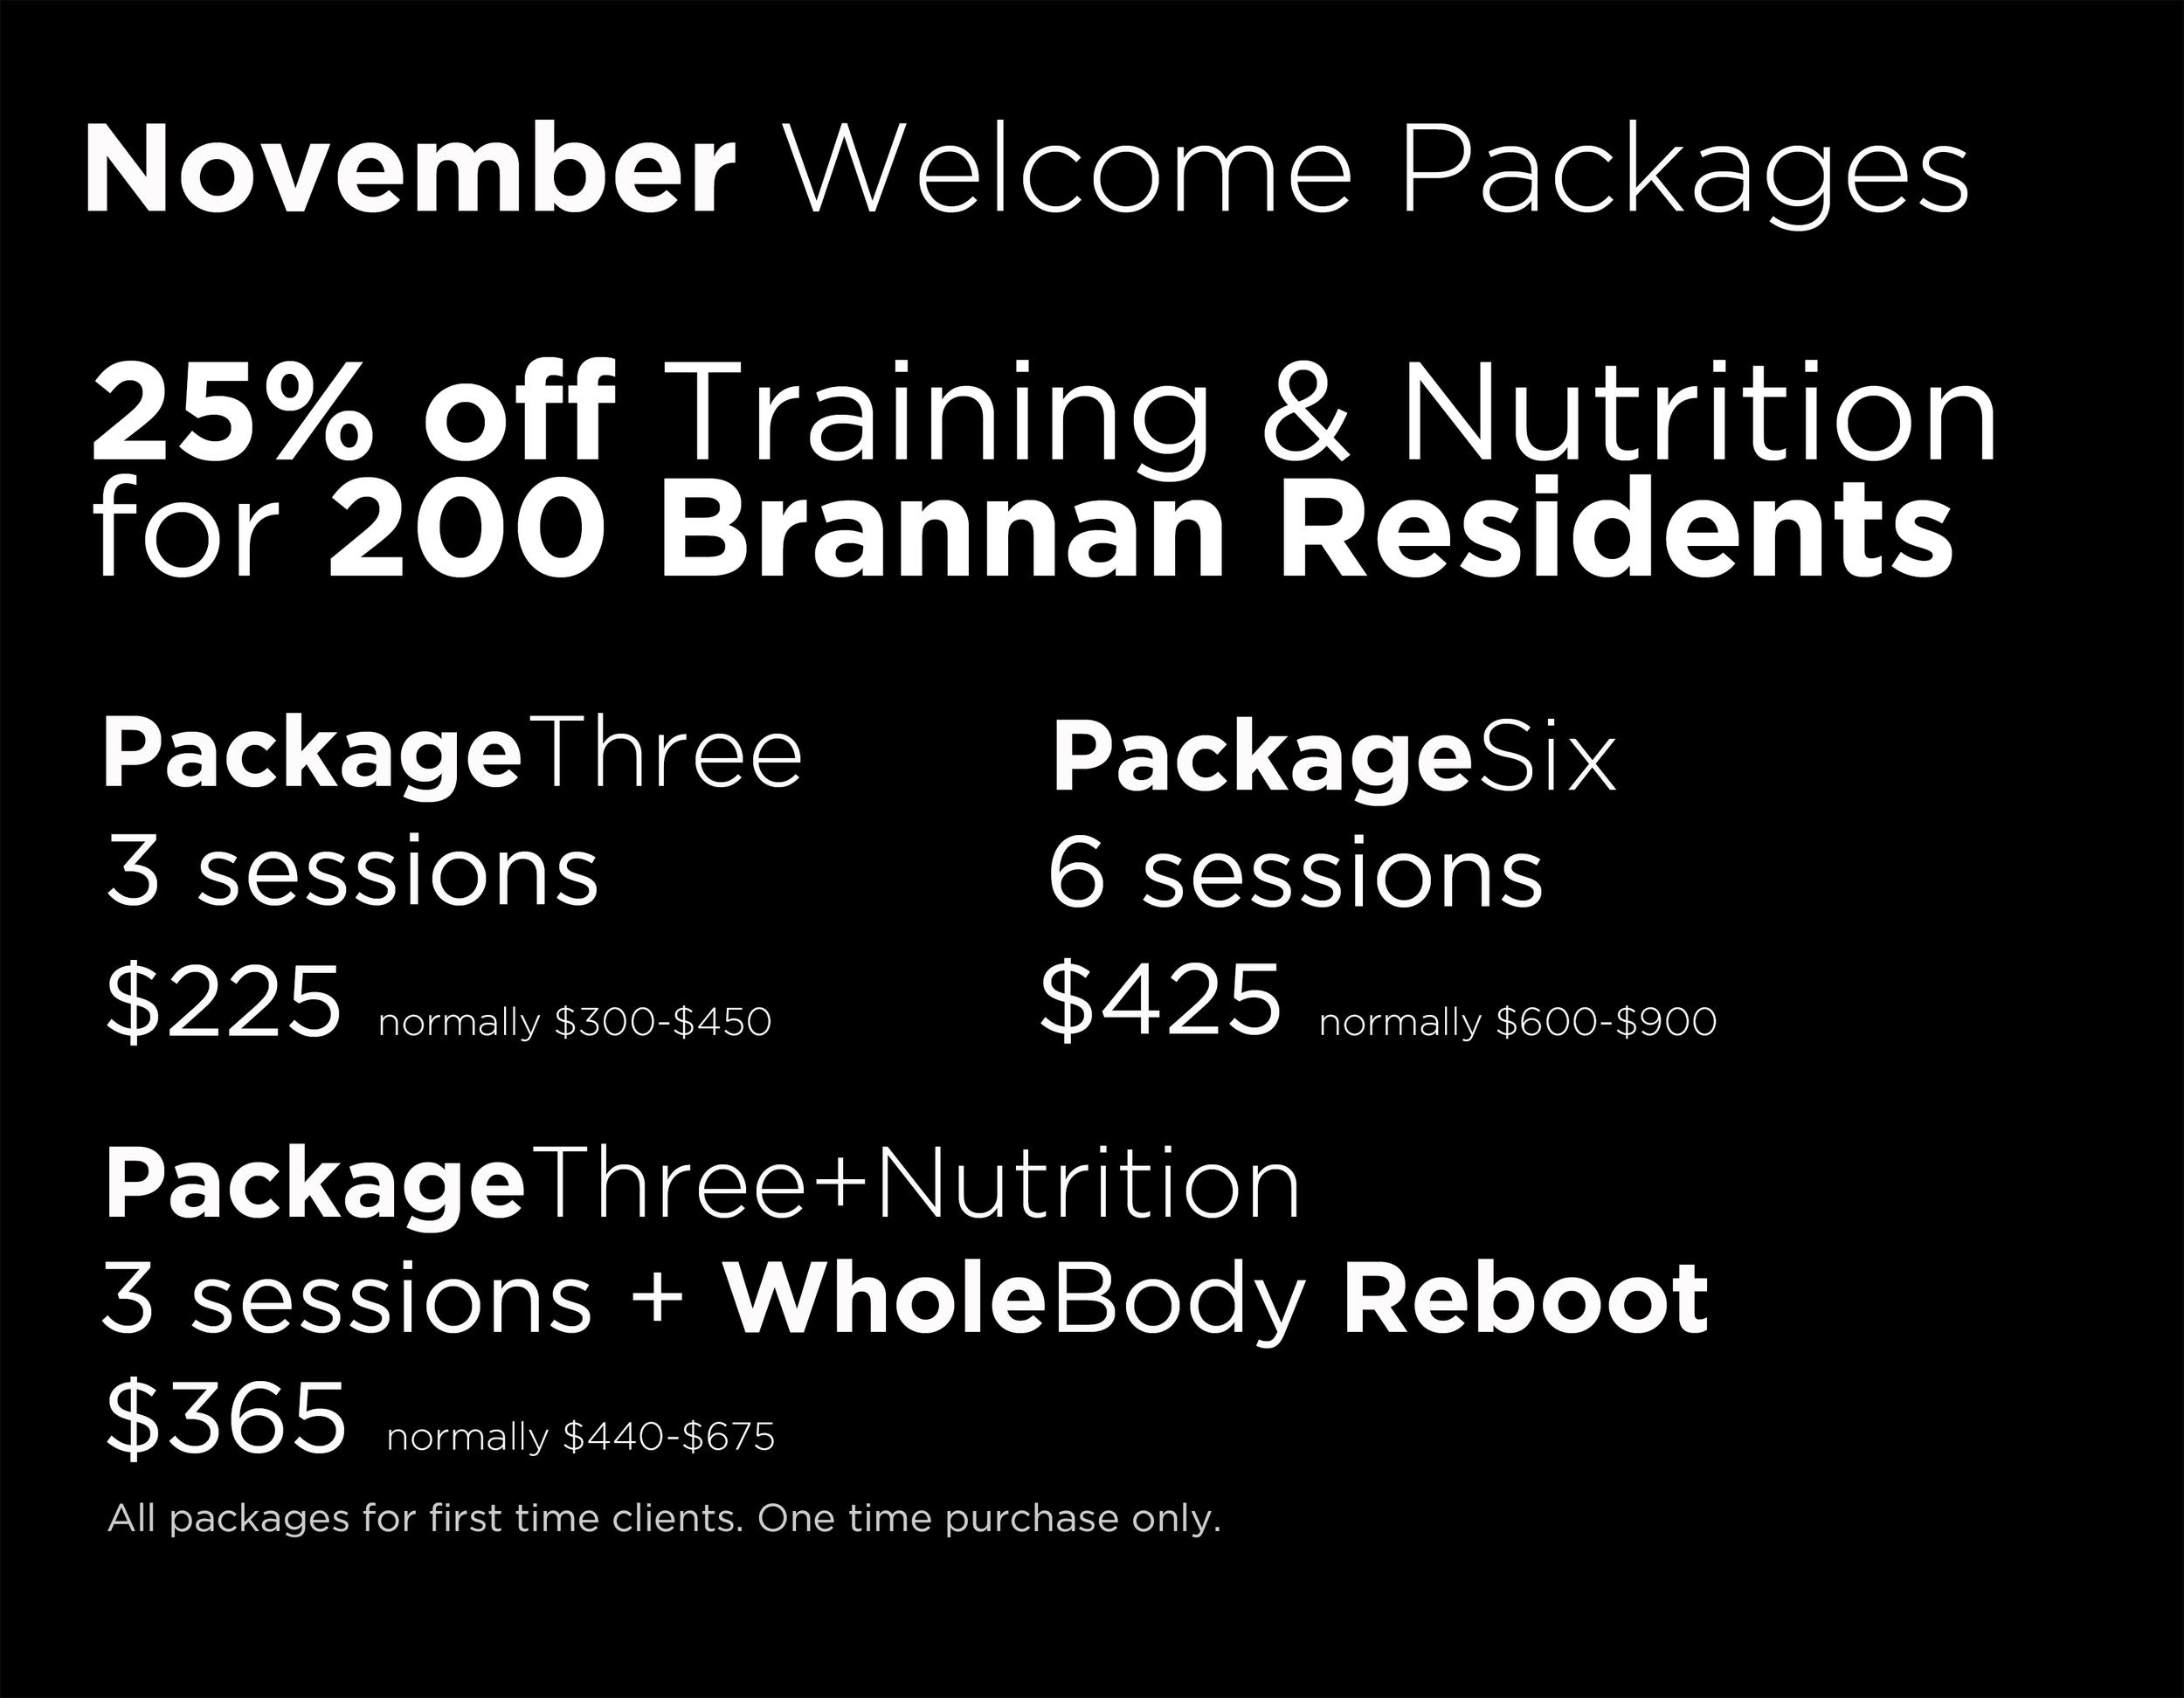 november welcome TSF 200 brannan st packages.jpg